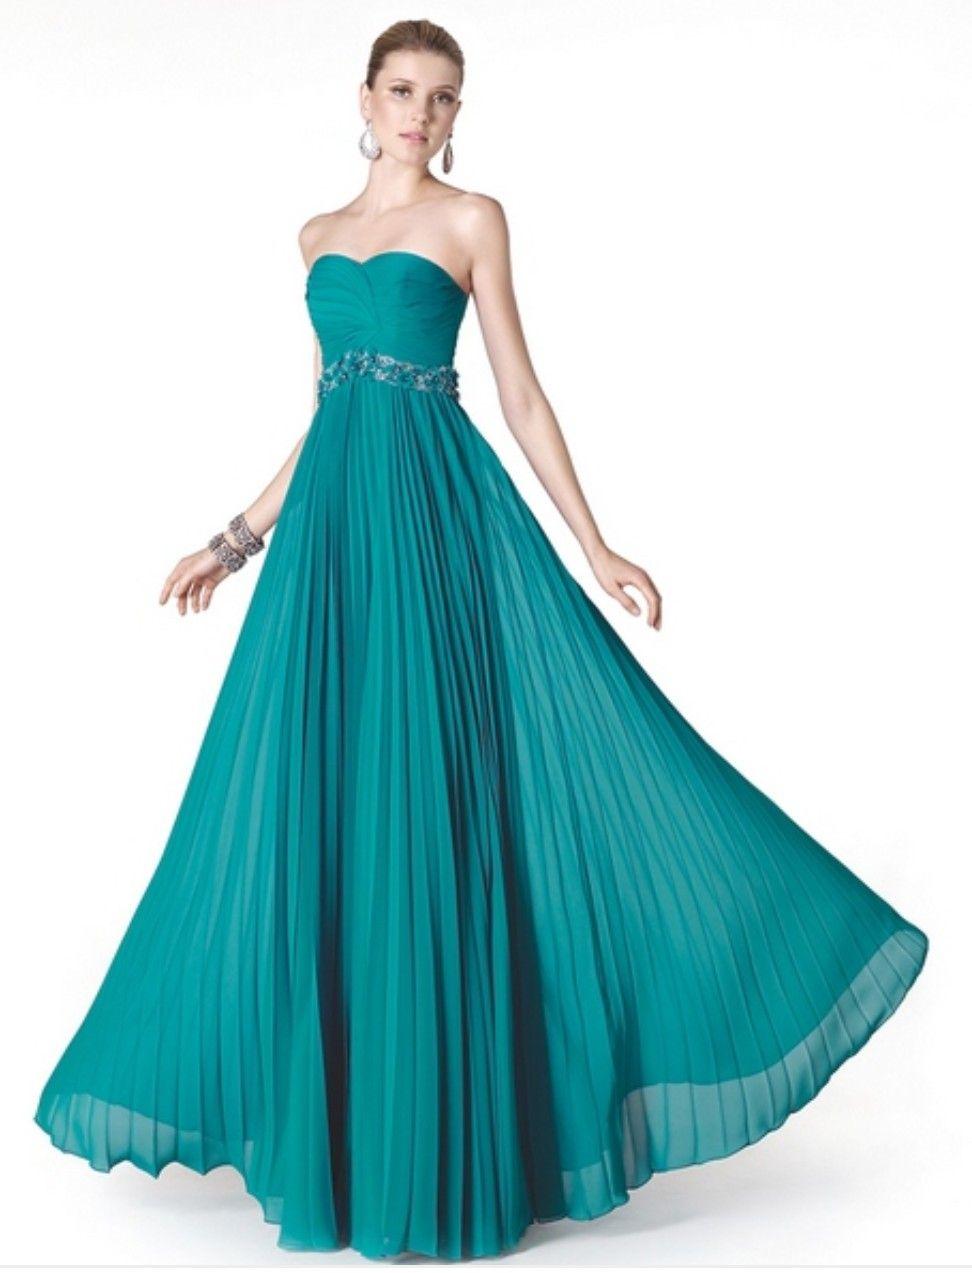 Pin by carol castorina on dresses pinterest